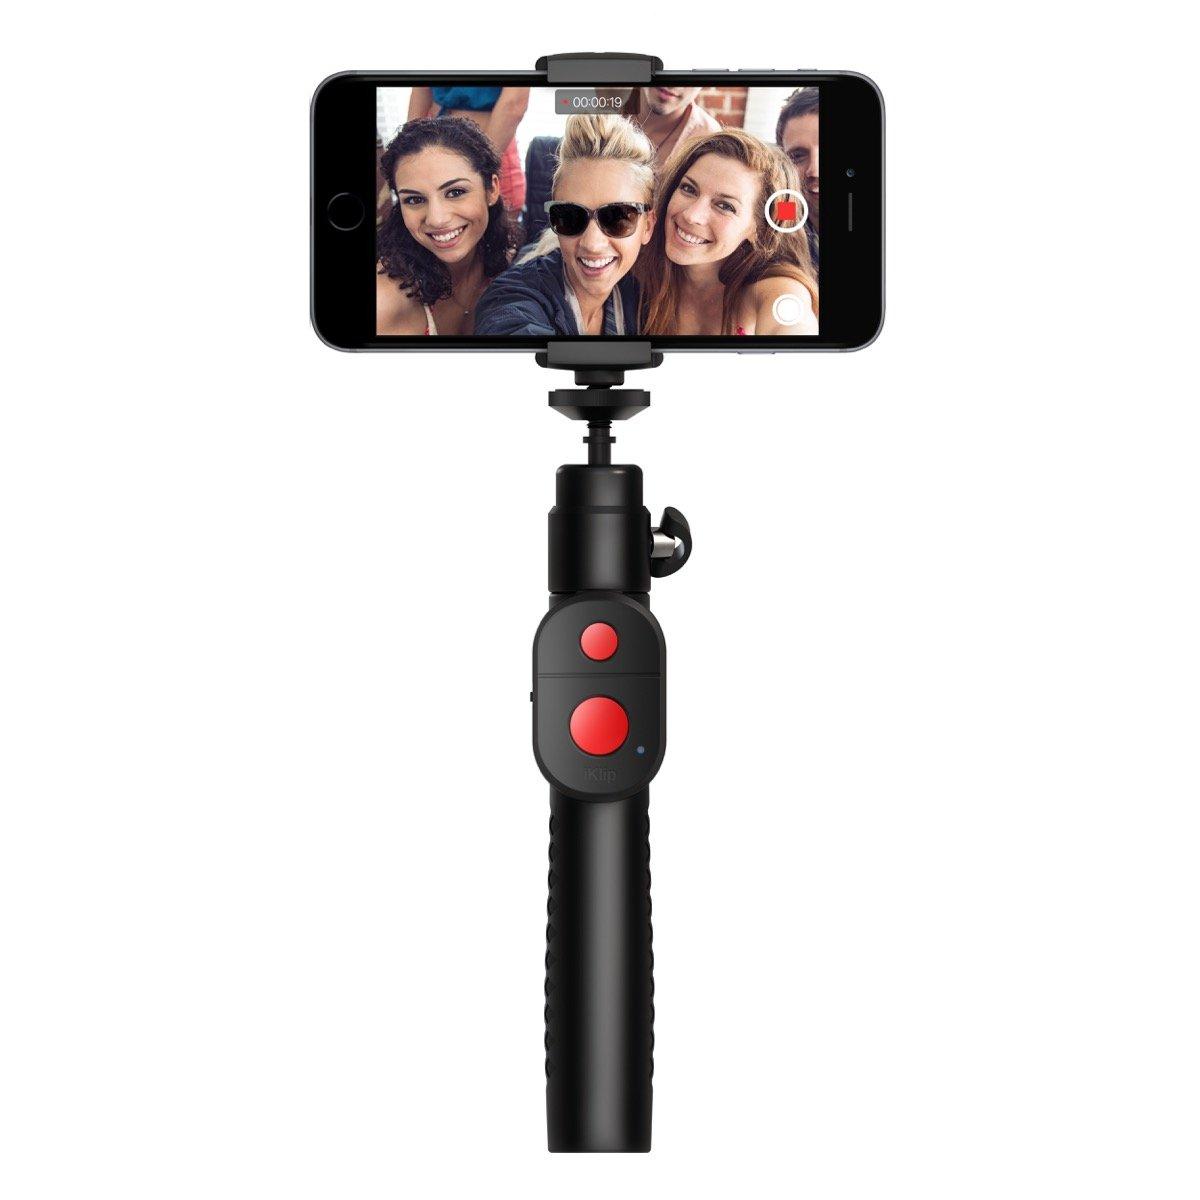 IK Multimedia iKlip GO Stylish, Extendable Monopod for Smartphones & Action Cameras